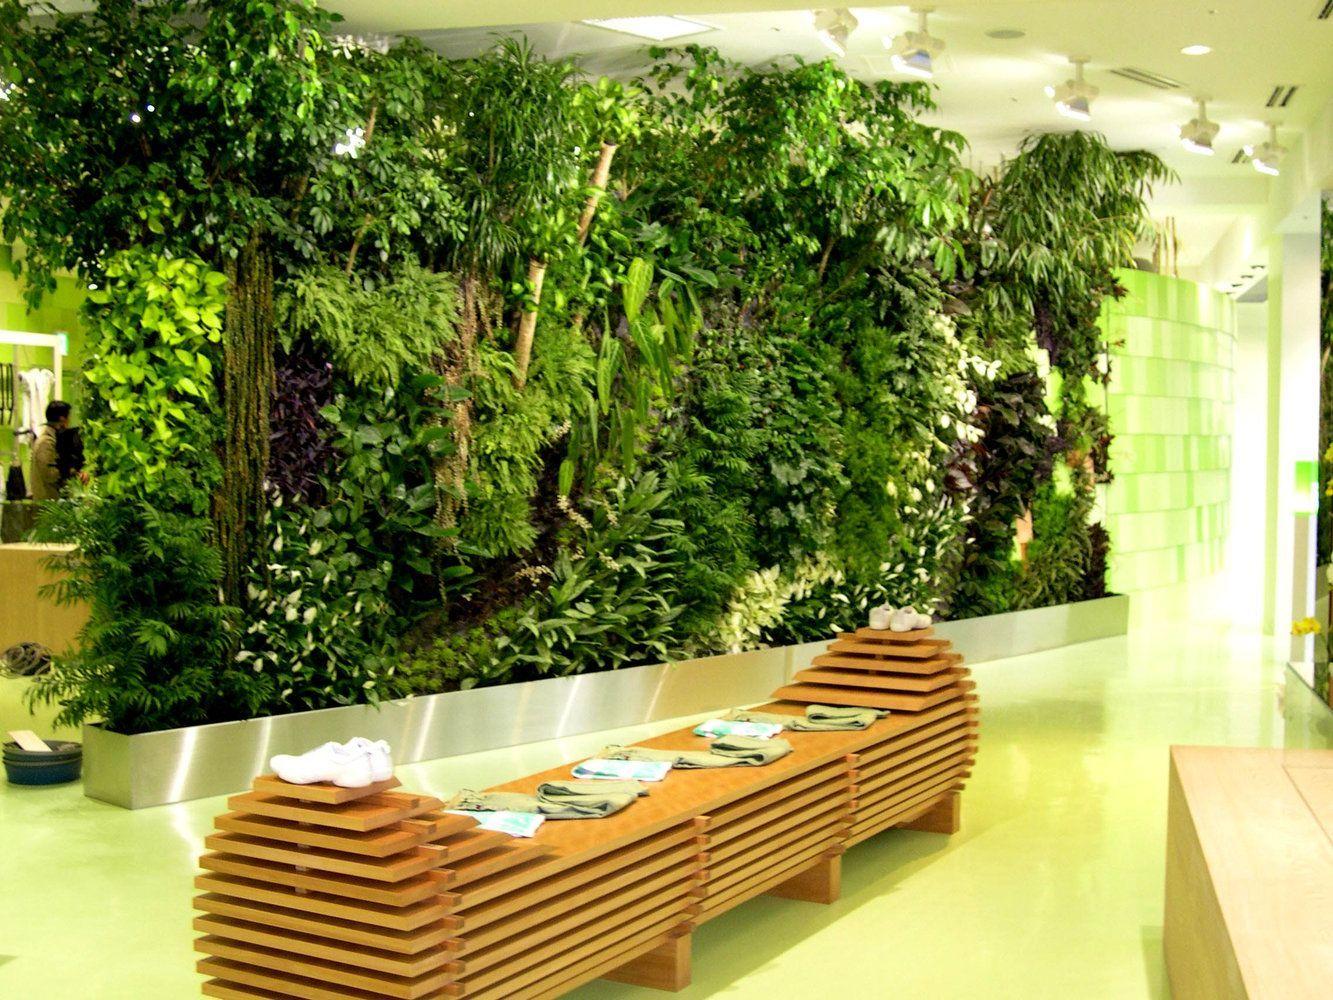 Fotos de Jardins Verticais – Inspirese